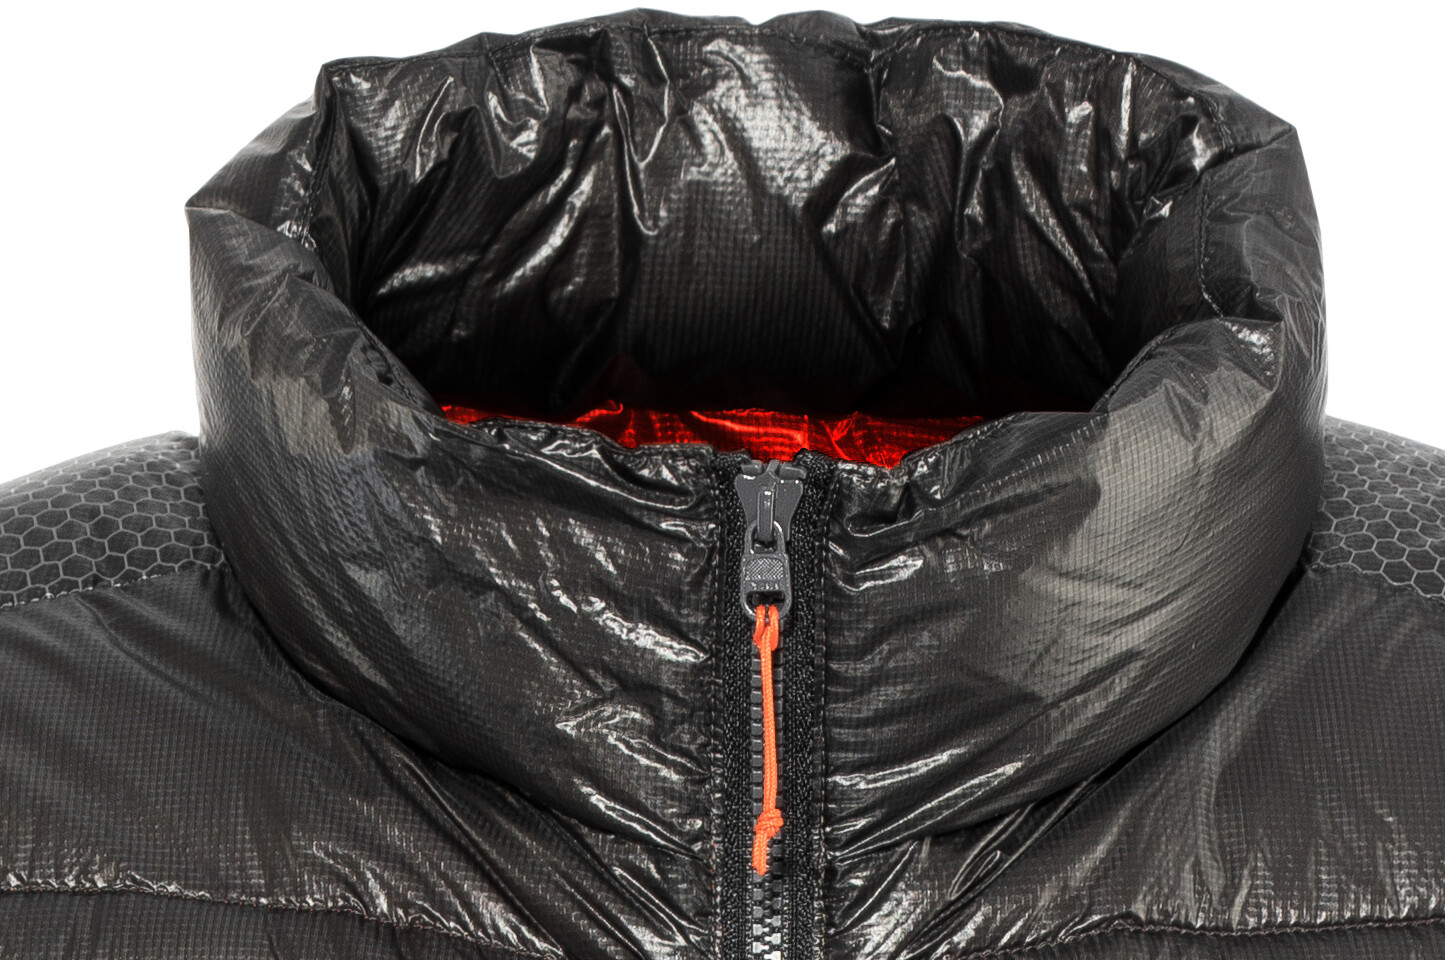 Yeti Cavoc Gilet piumino ultraleggero Uomo, dark gull grey/madarin red (2020) 681386 IKAey